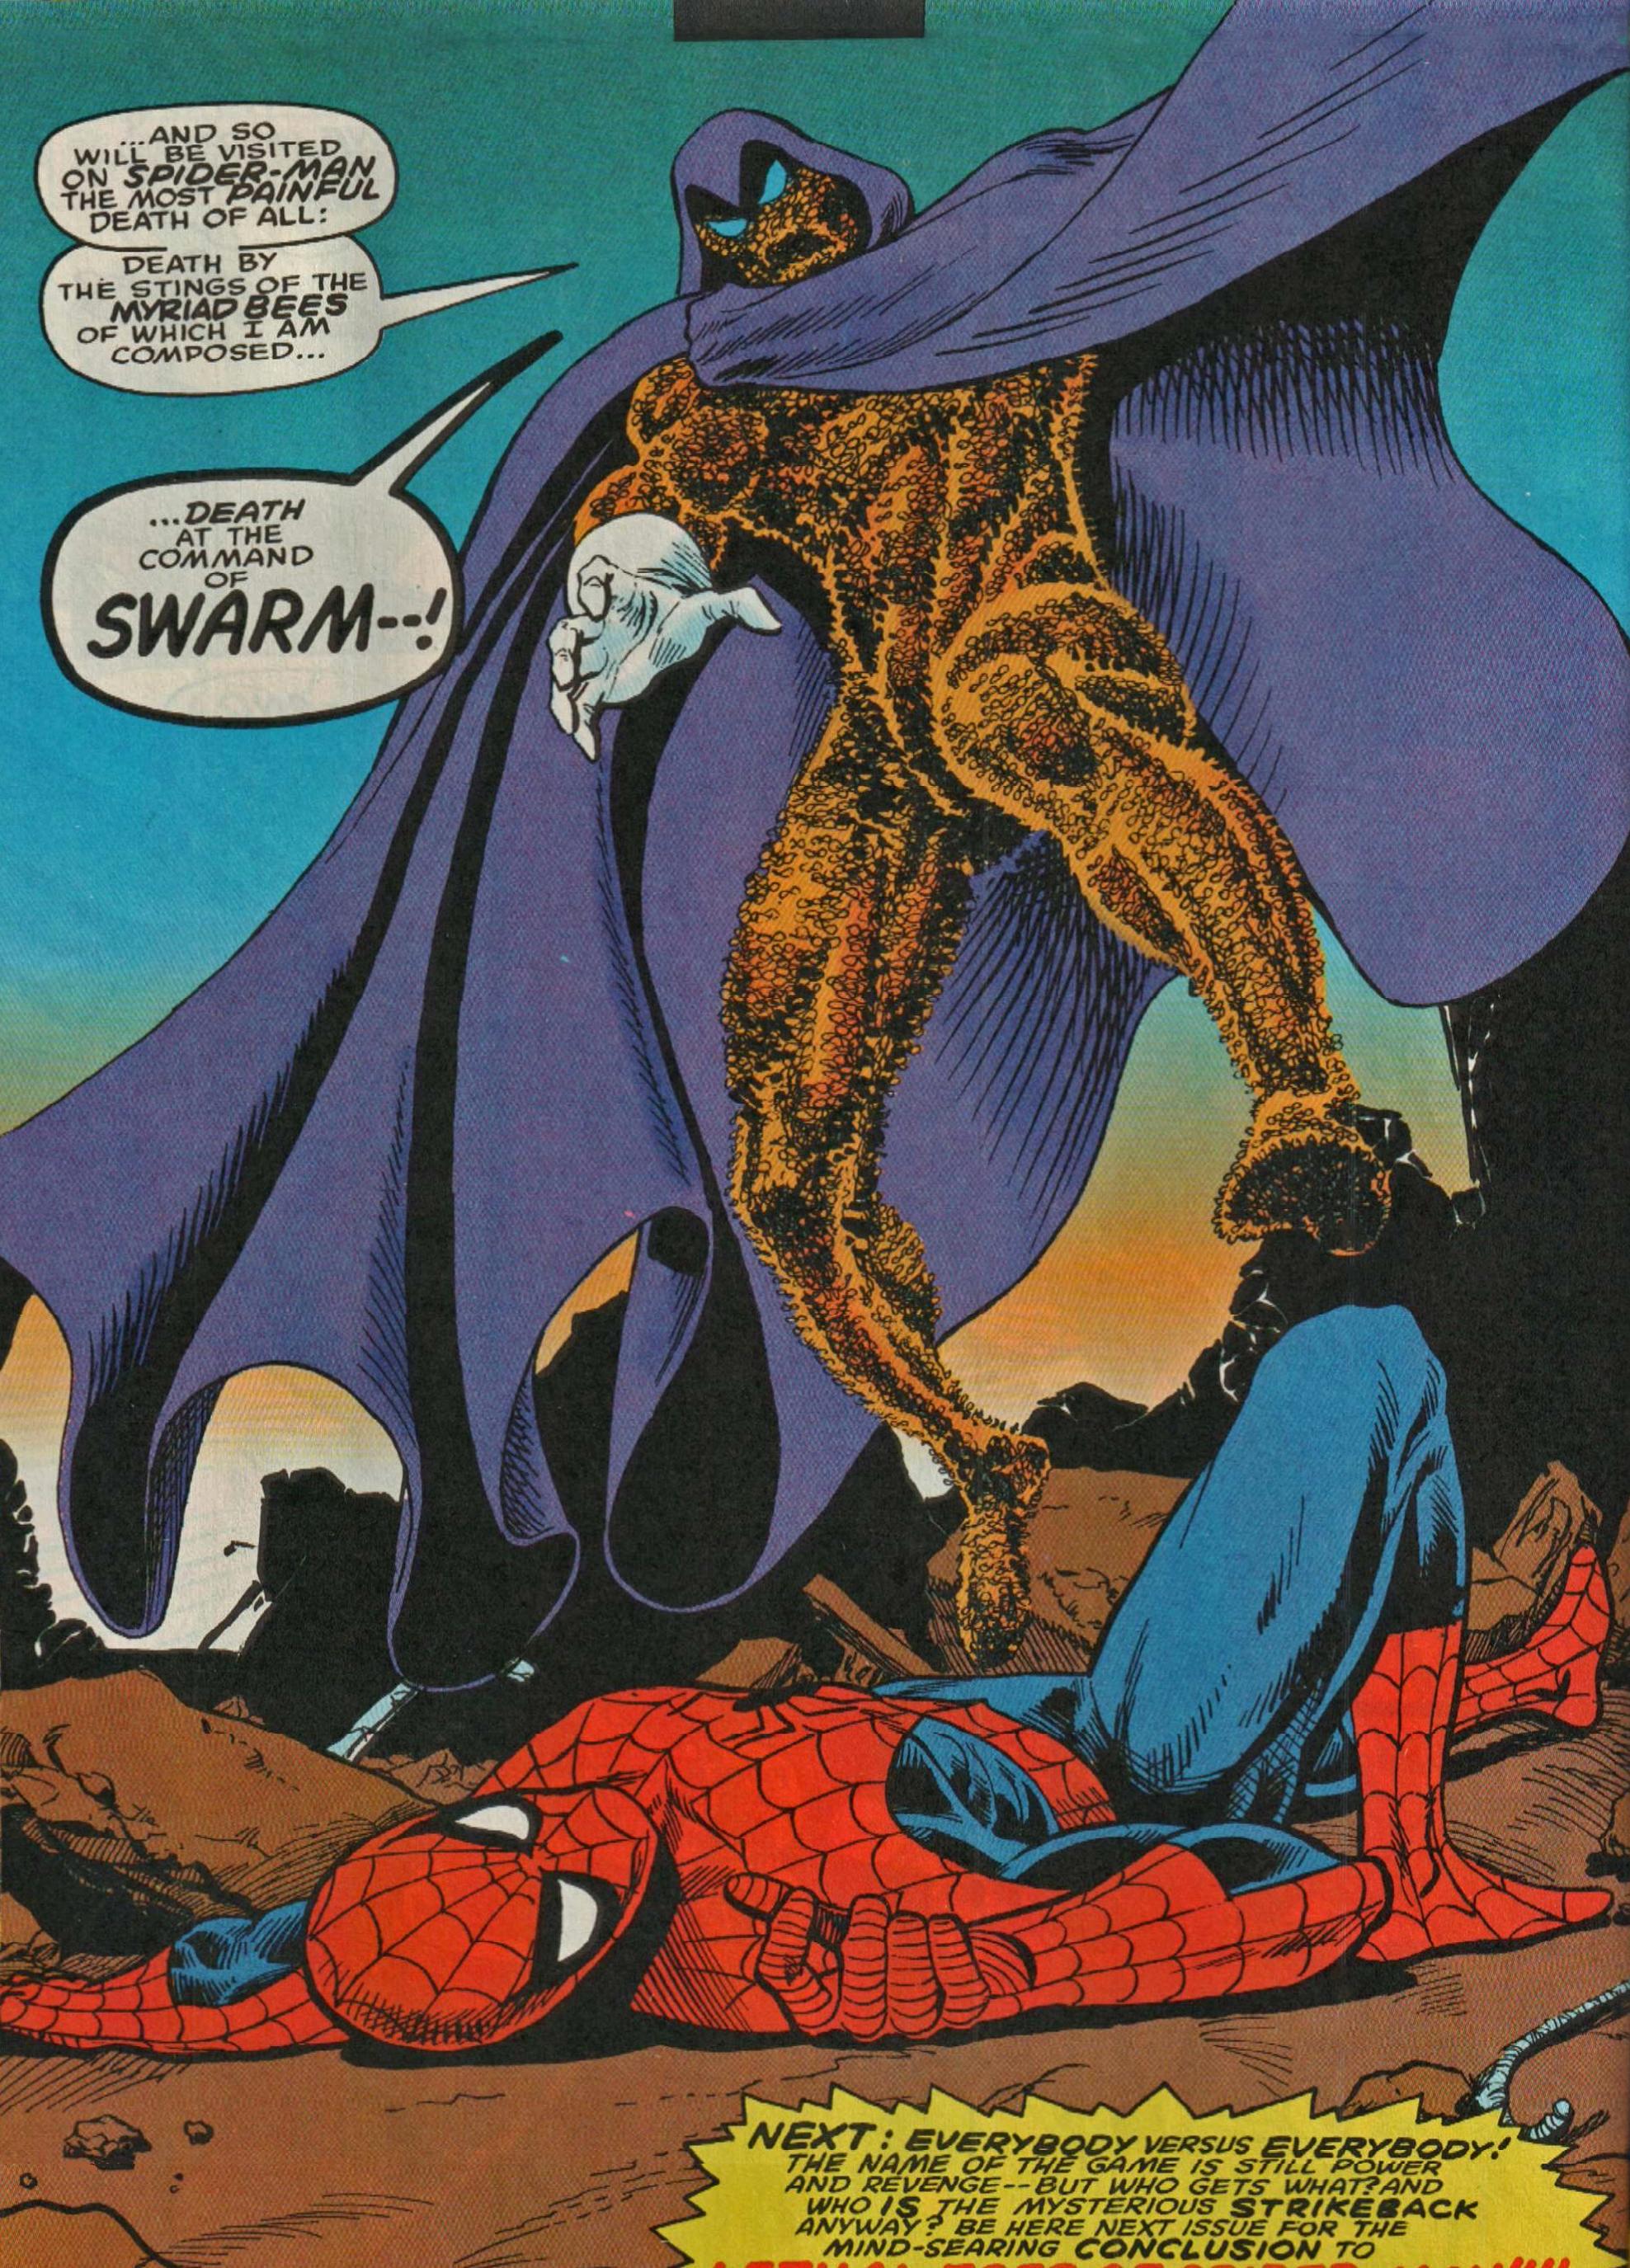 Swarm [Marvel,Spiderman] | Marvel spiderman, Comic villains, Comic books art